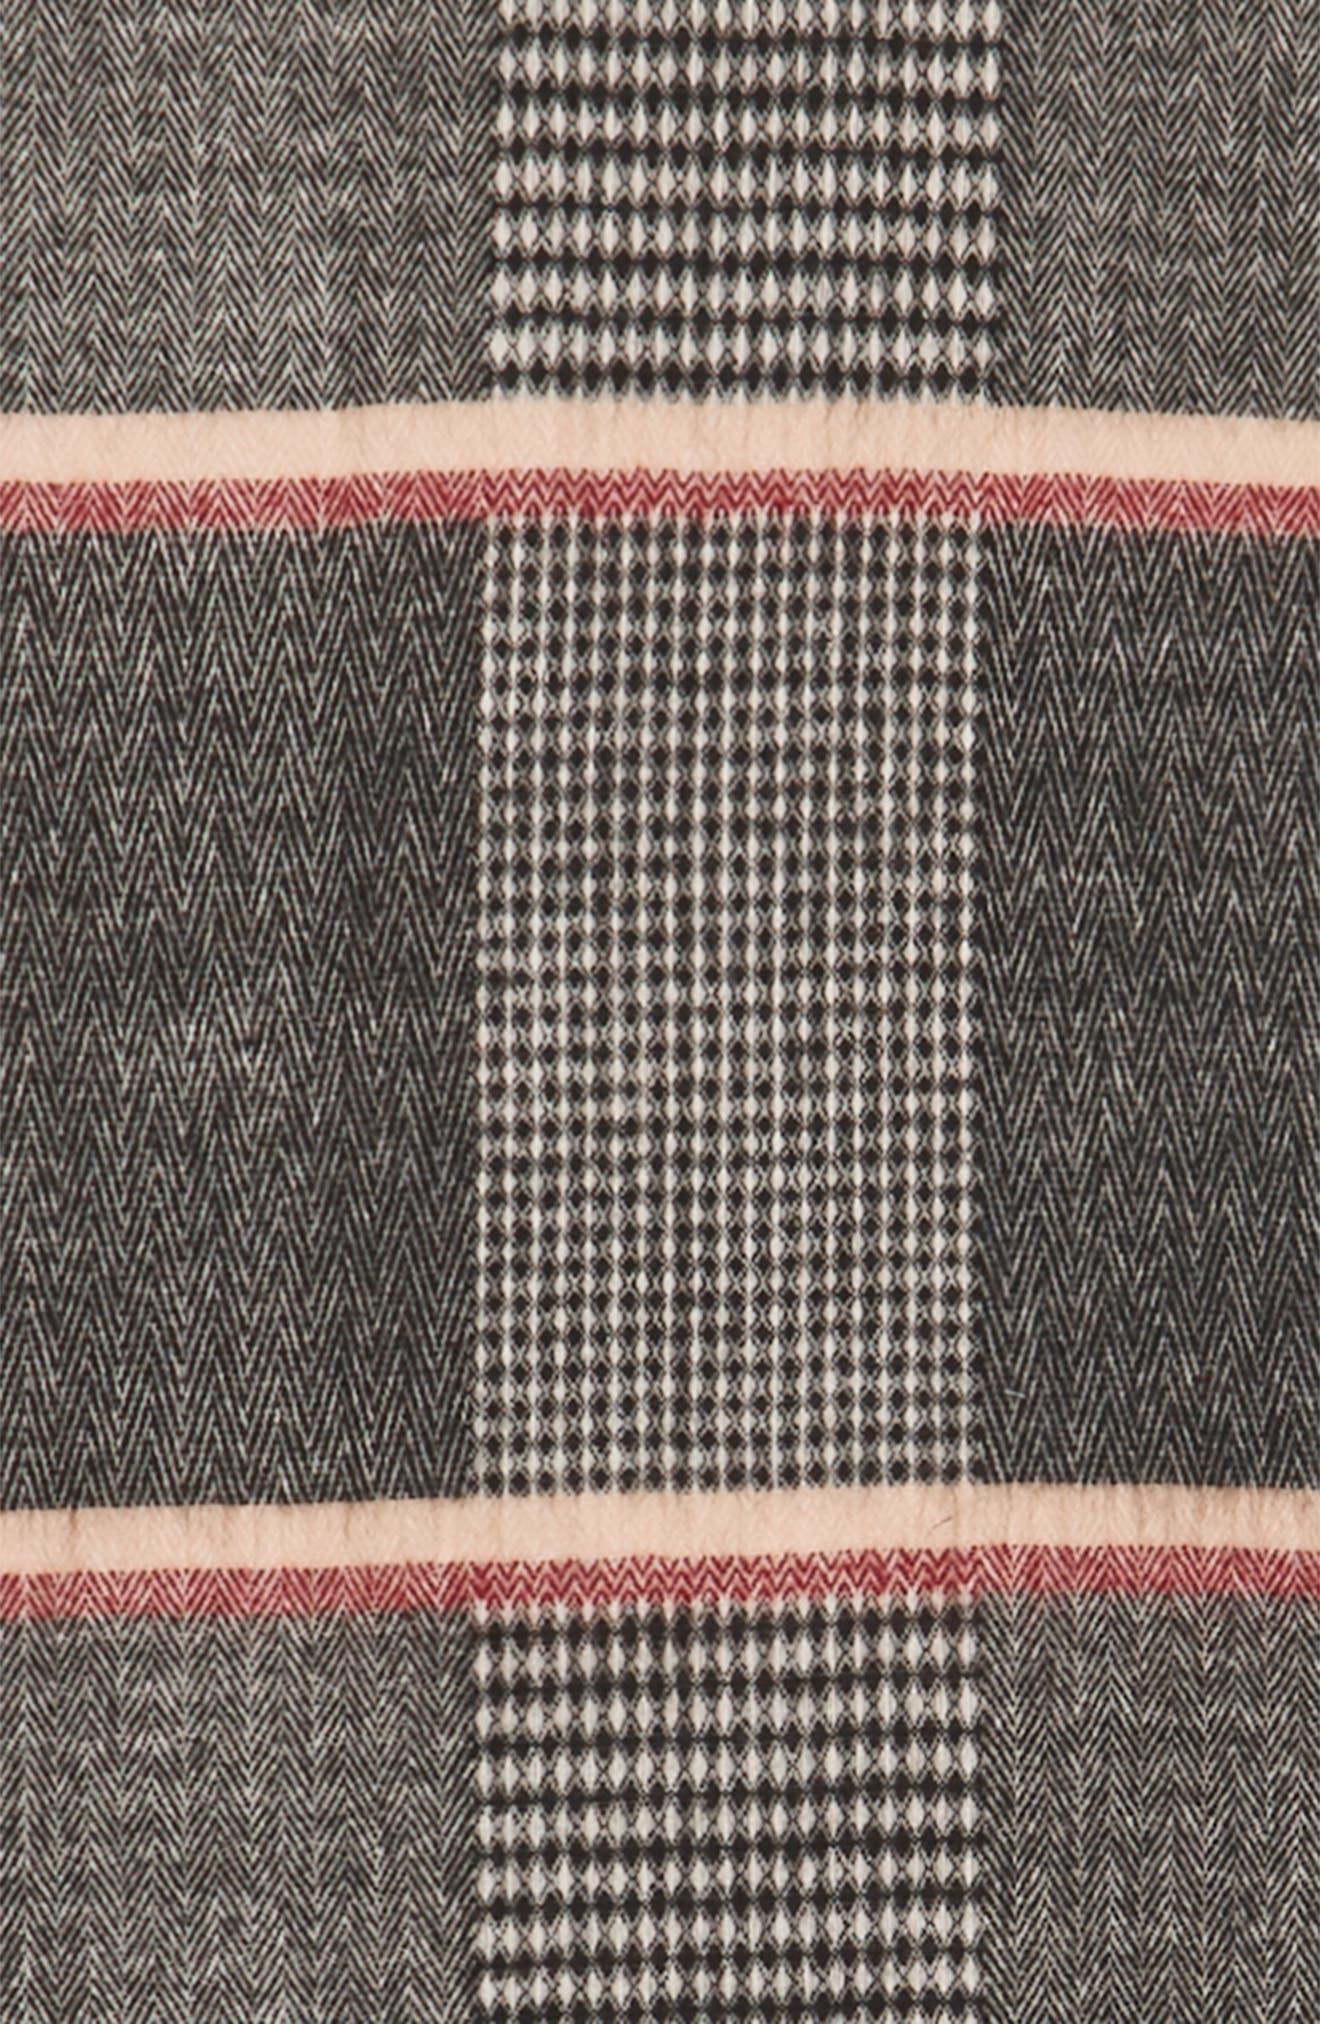 Pinstripe Scarf,                             Alternate thumbnail 3, color,                             Black/ Tan